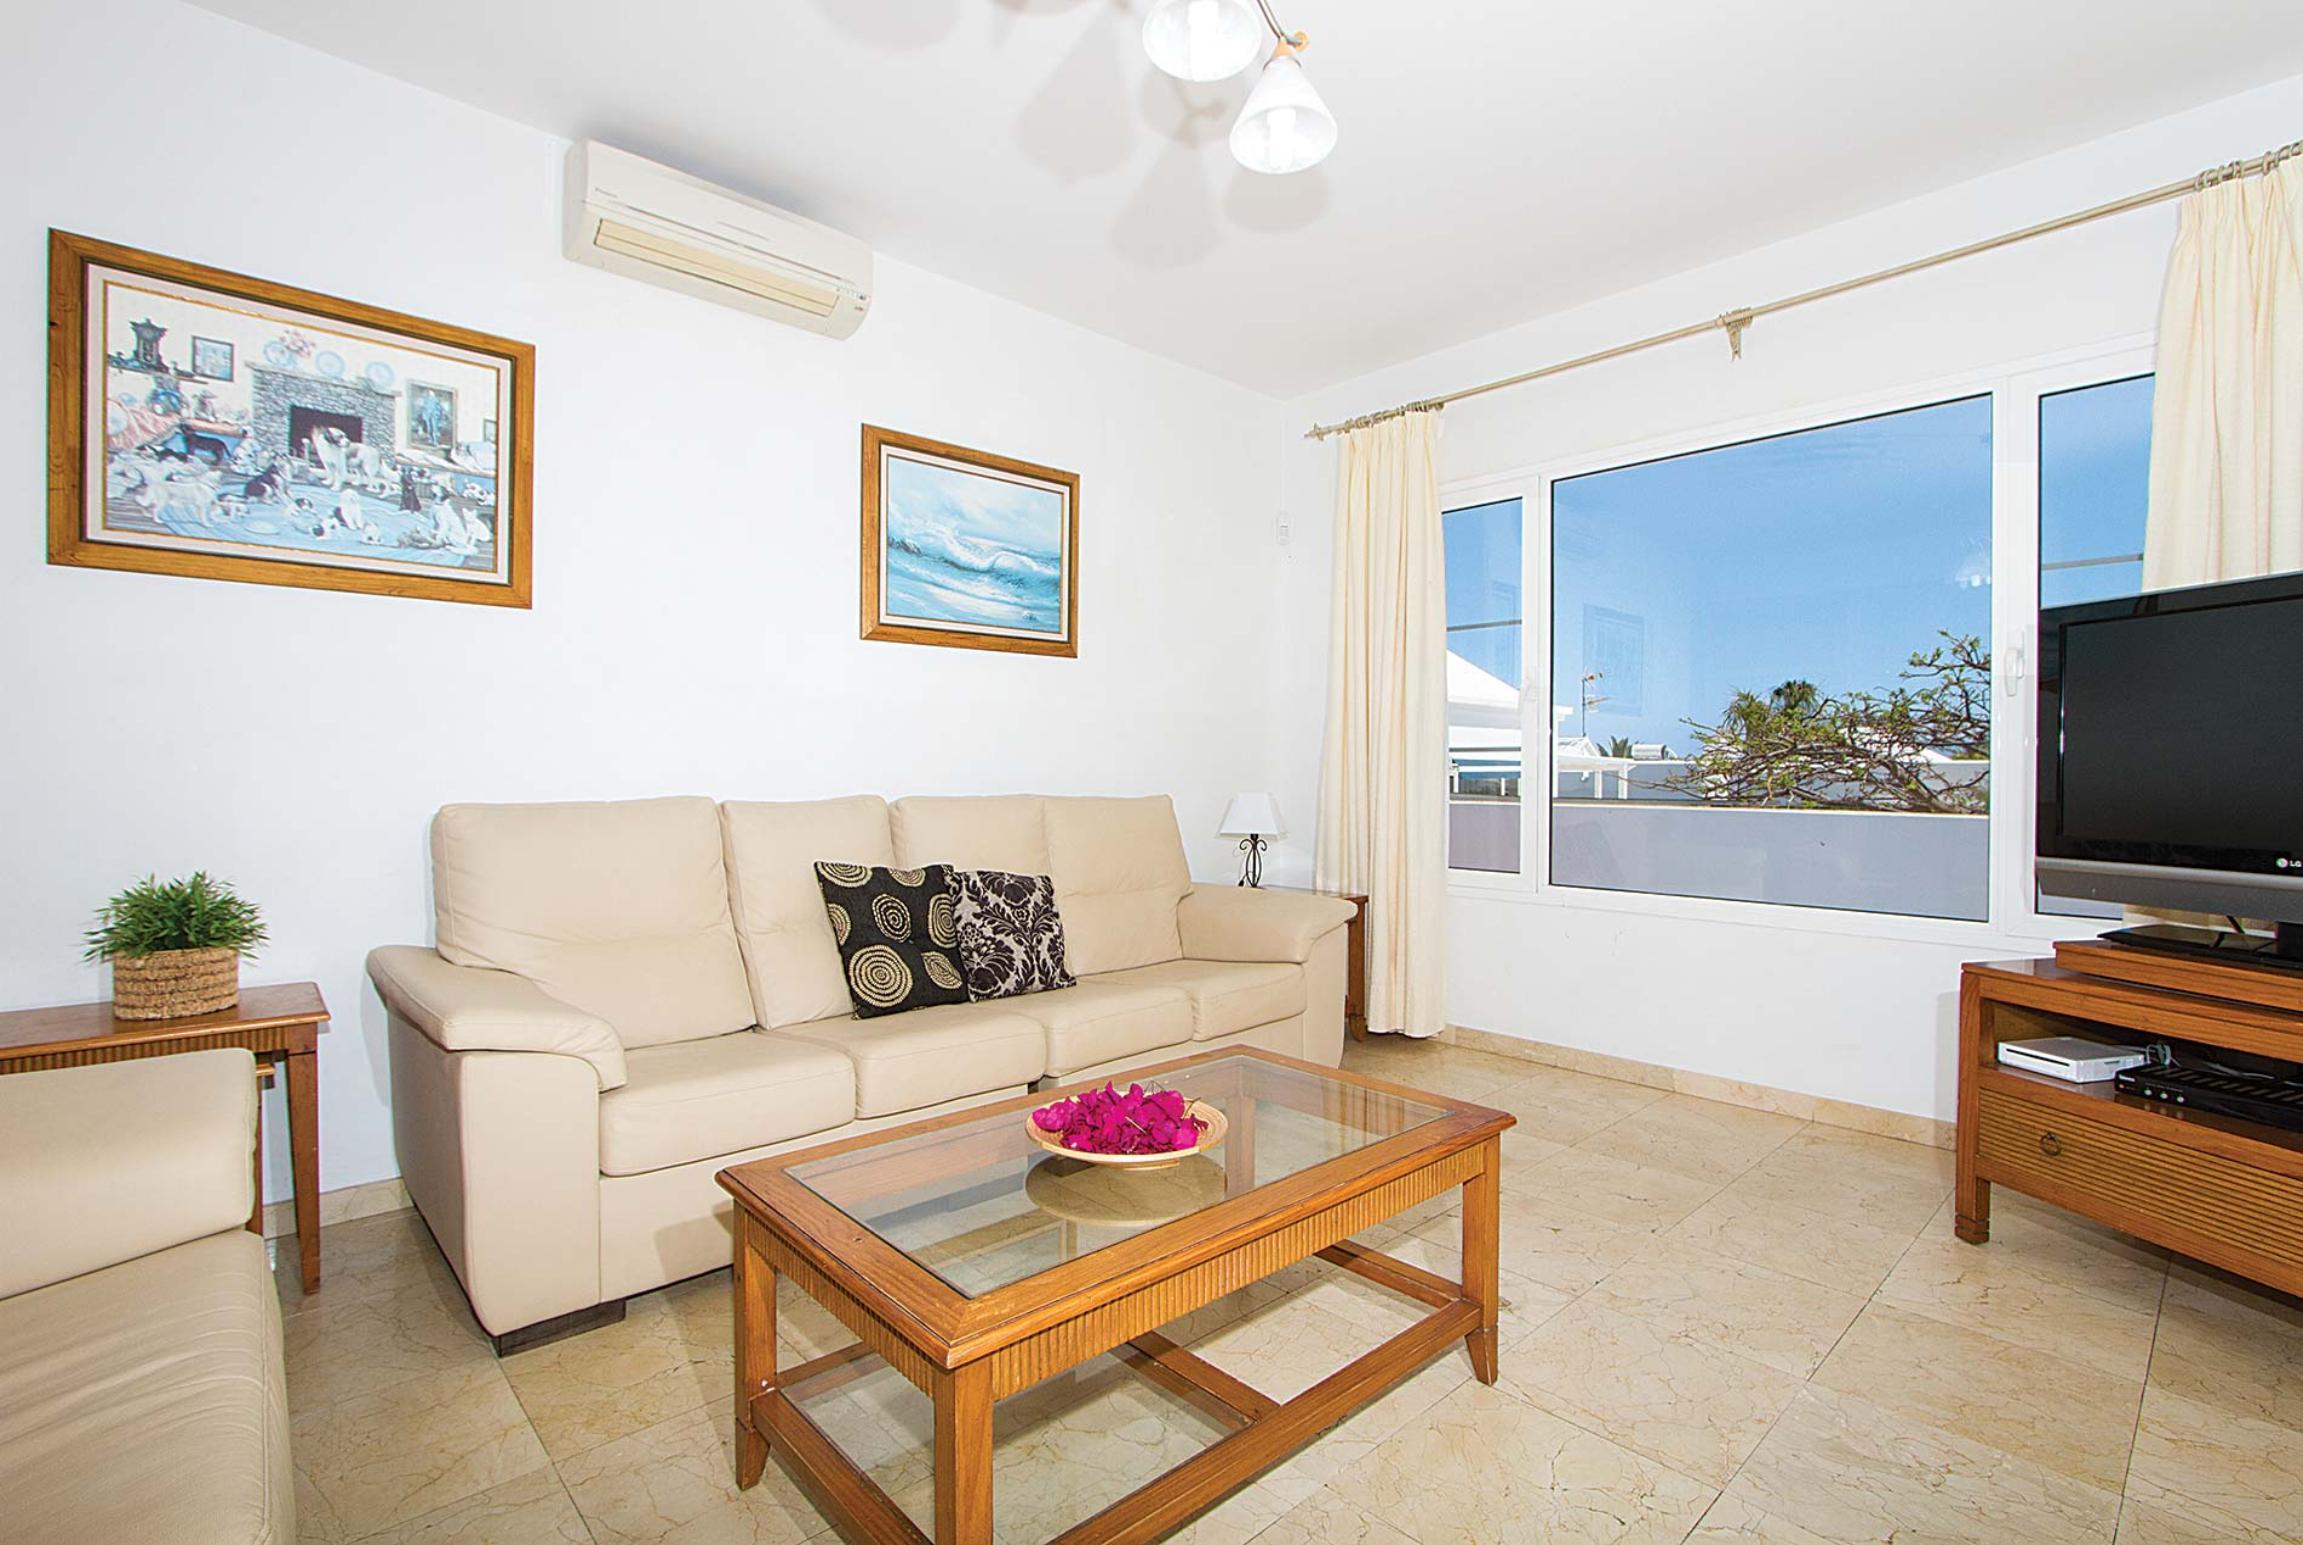 Ferienhaus Tania (2654356), Puerto del Carmen, Lanzarote, Kanarische Inseln, Spanien, Bild 3